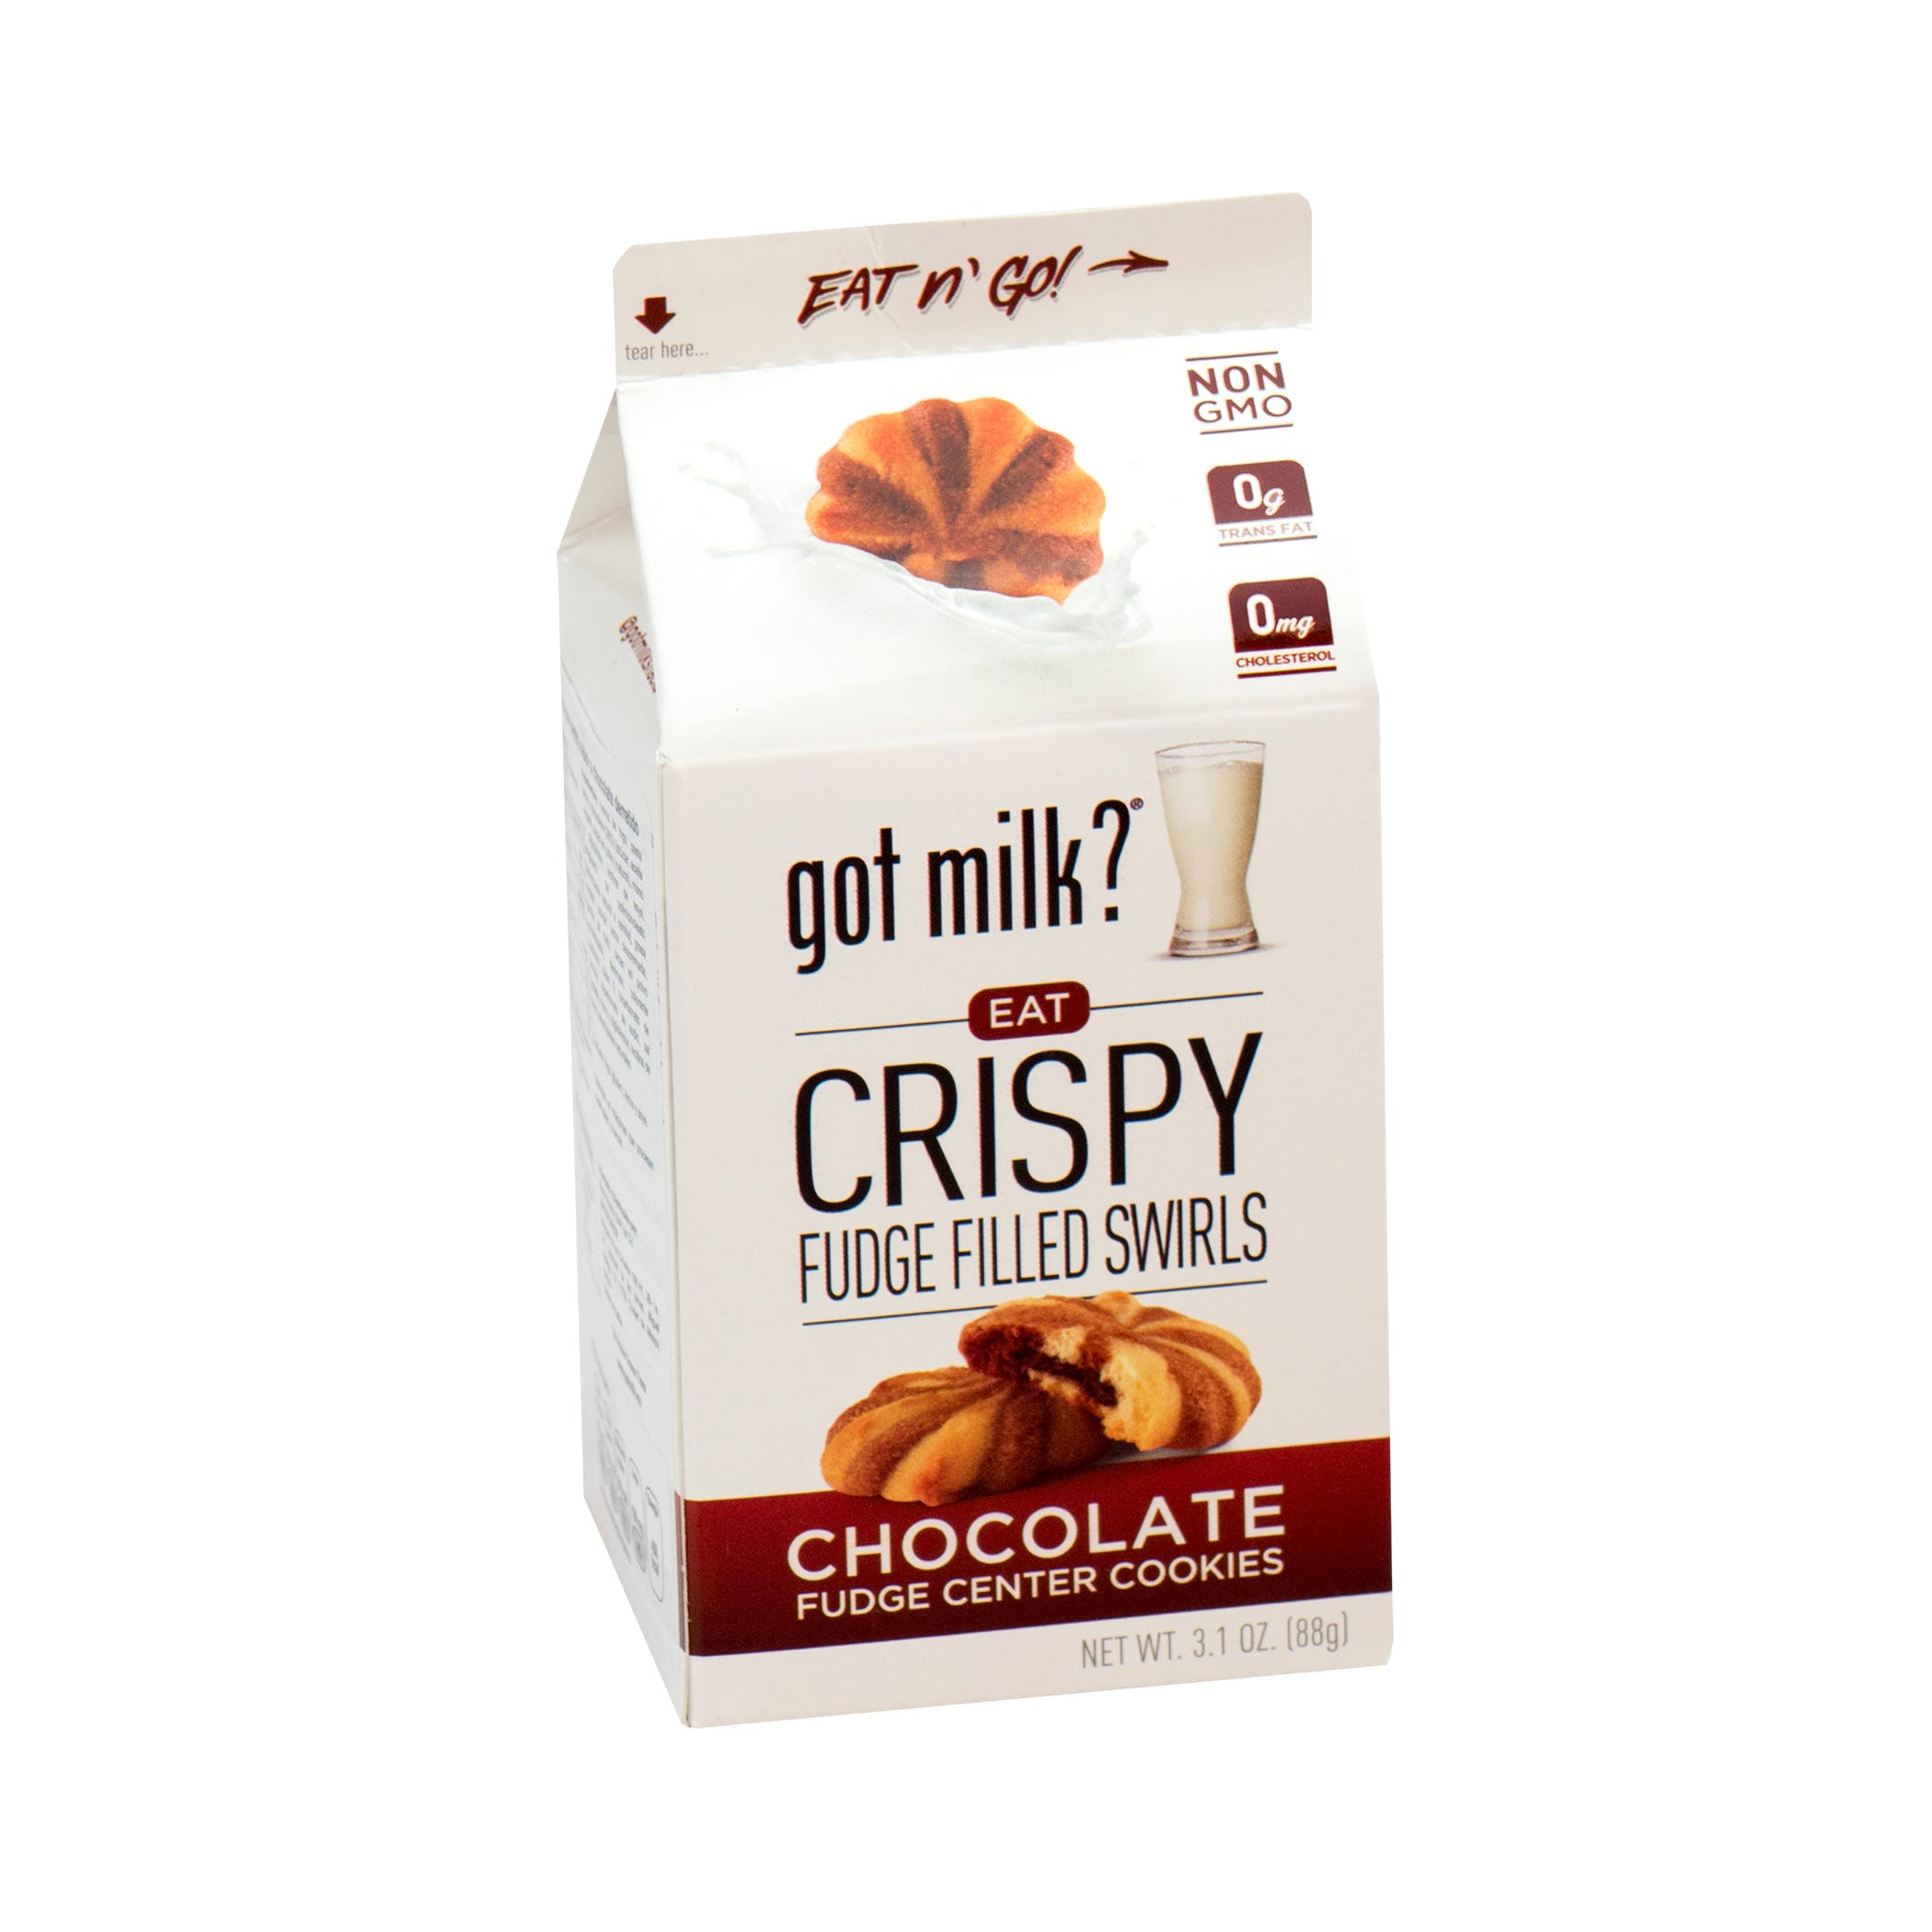 Galletas rellenas de chocolate Got Milk® de 88 g